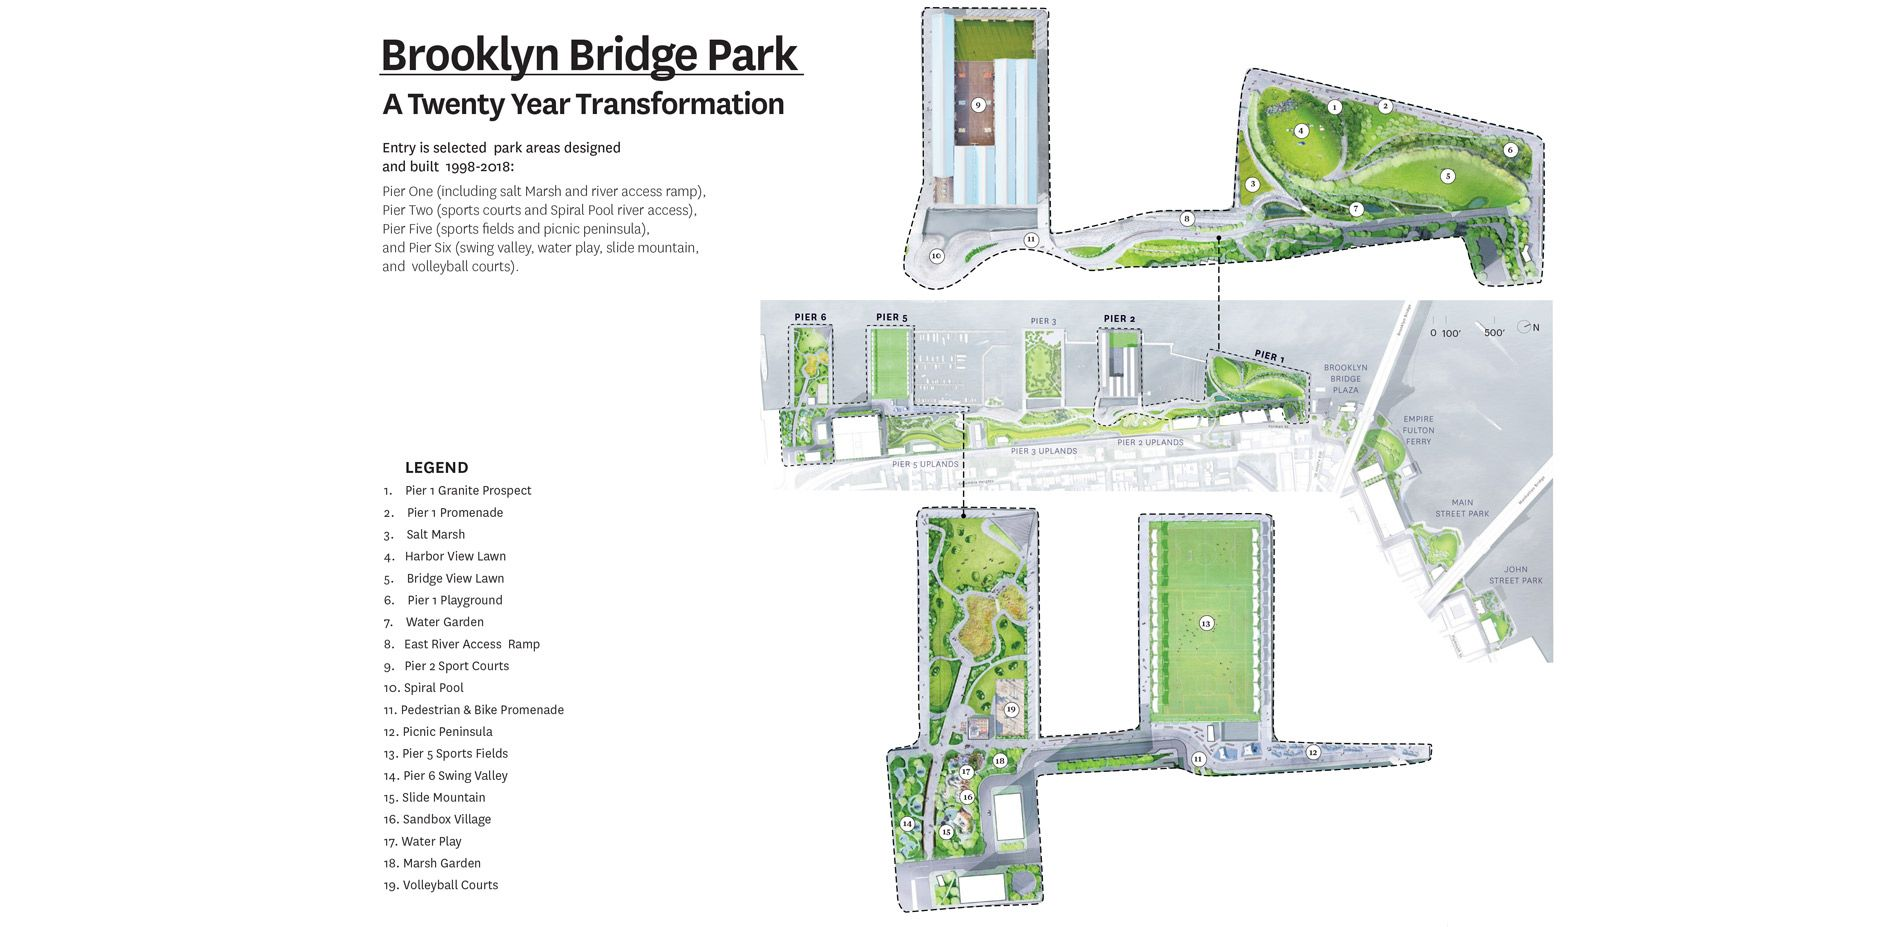 Brooklyn Ny Usa Michael Van Valkenburgh Associates Inc Client Brooklyn Bridge Park Brooklyn Bridge Park Brooklyn Bridge Brooklyn